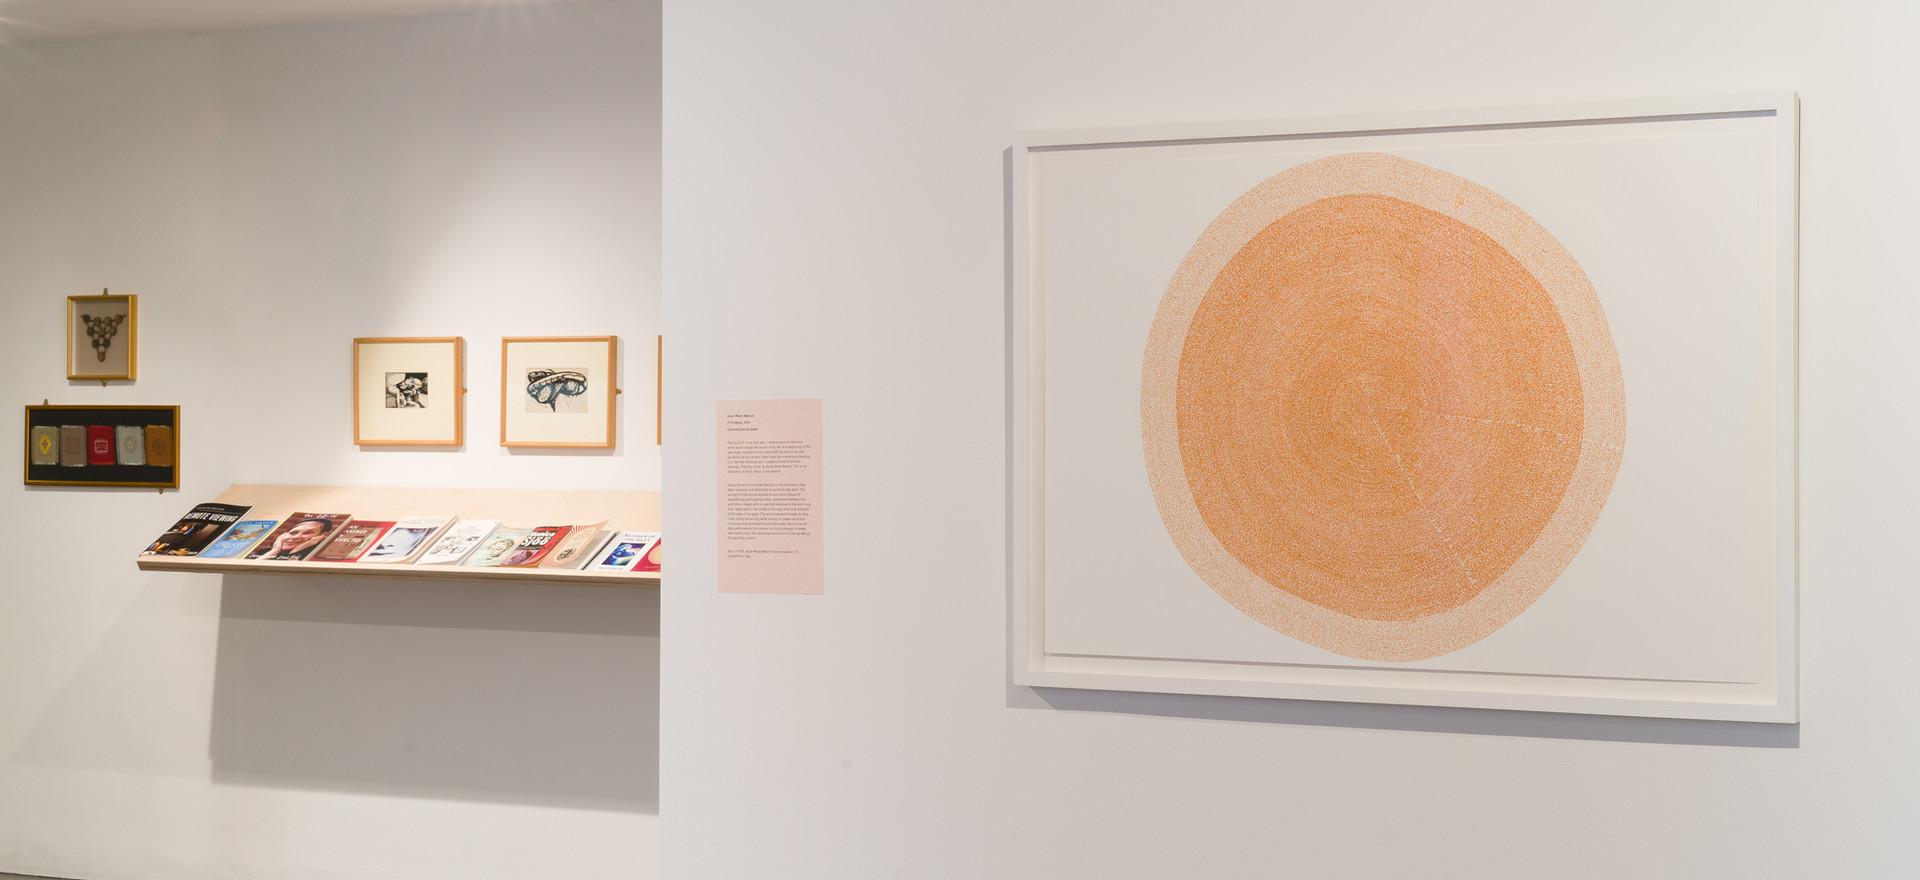 Exhibition installation view, Hummadruz, Newlyn Art Gallery (2018), Marie (2014)